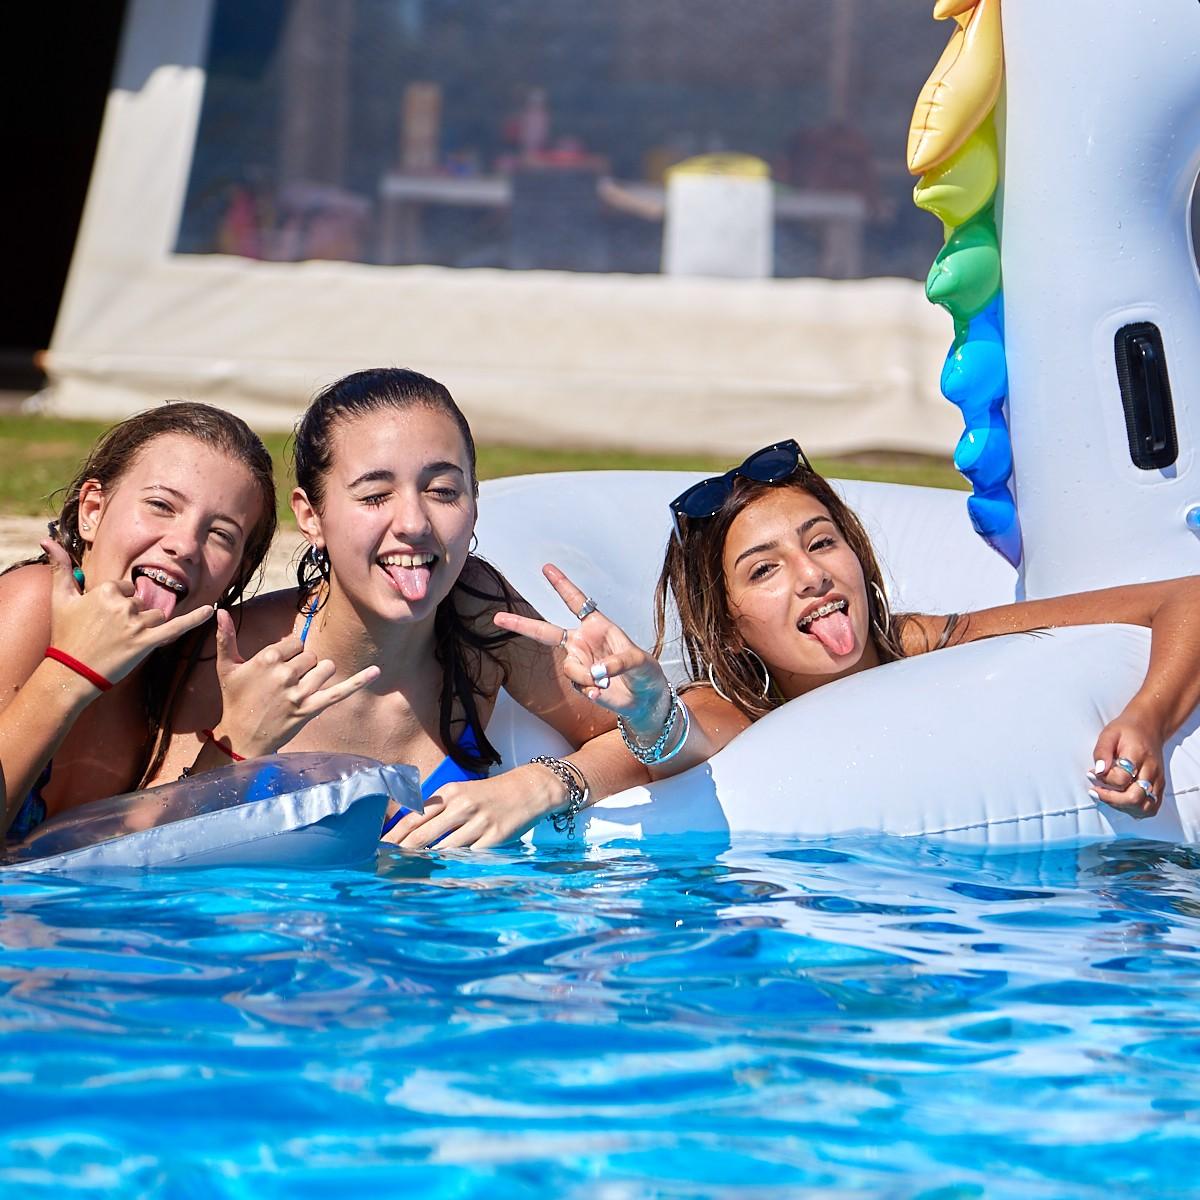 book-fotografico-para-15-años-pileta-chicas-sesion-divertida-fotografias-fotos-photograpy-luiggi-benedetto-cordoba-argentina-quinceañeras-  (1)